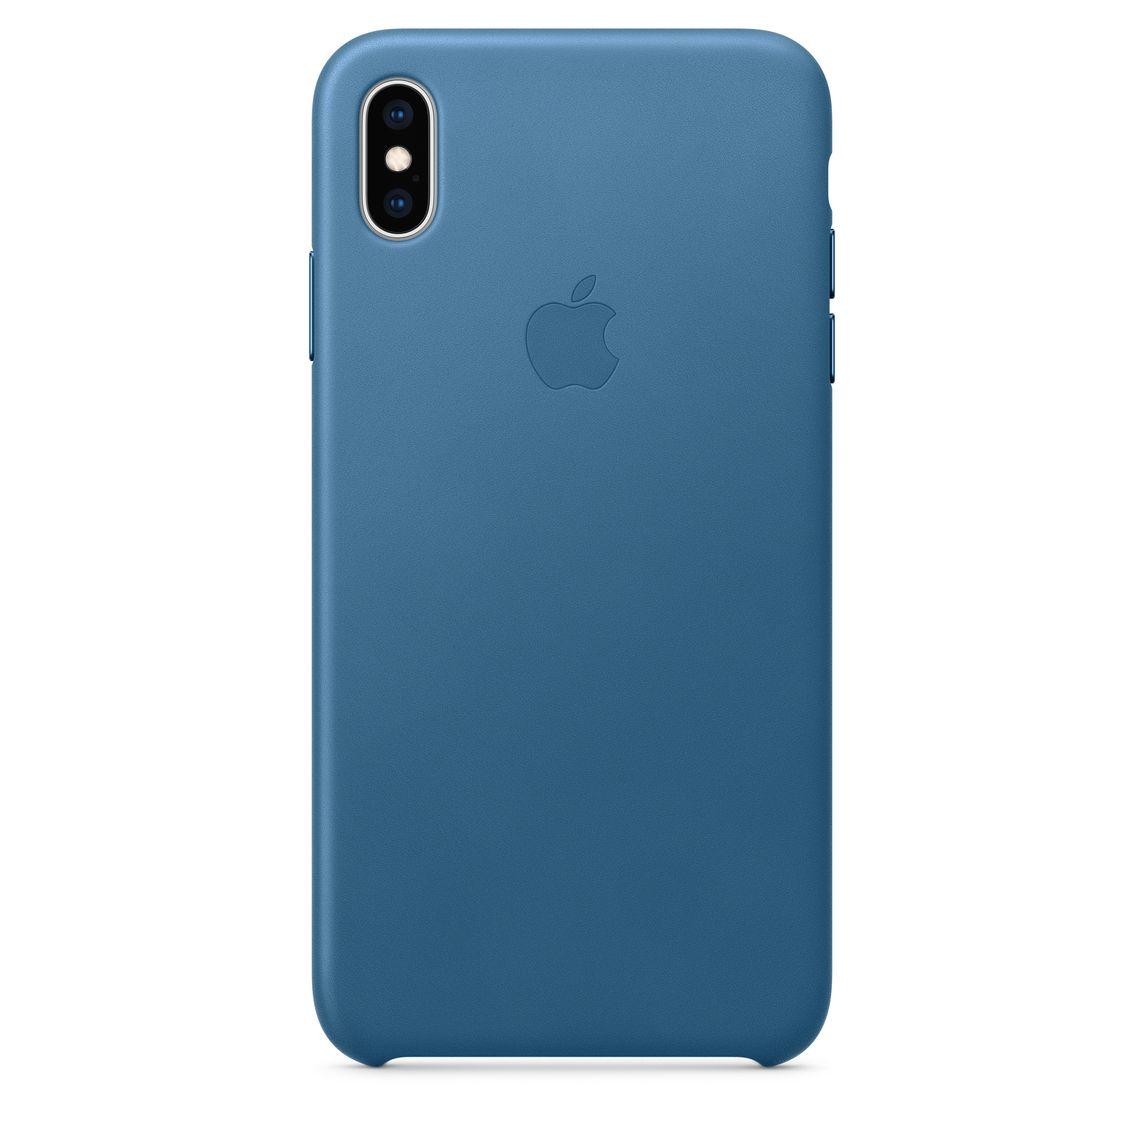 online retailer da443 31aa9 iPhone XS Max Leather Case - Cape Cod Blue